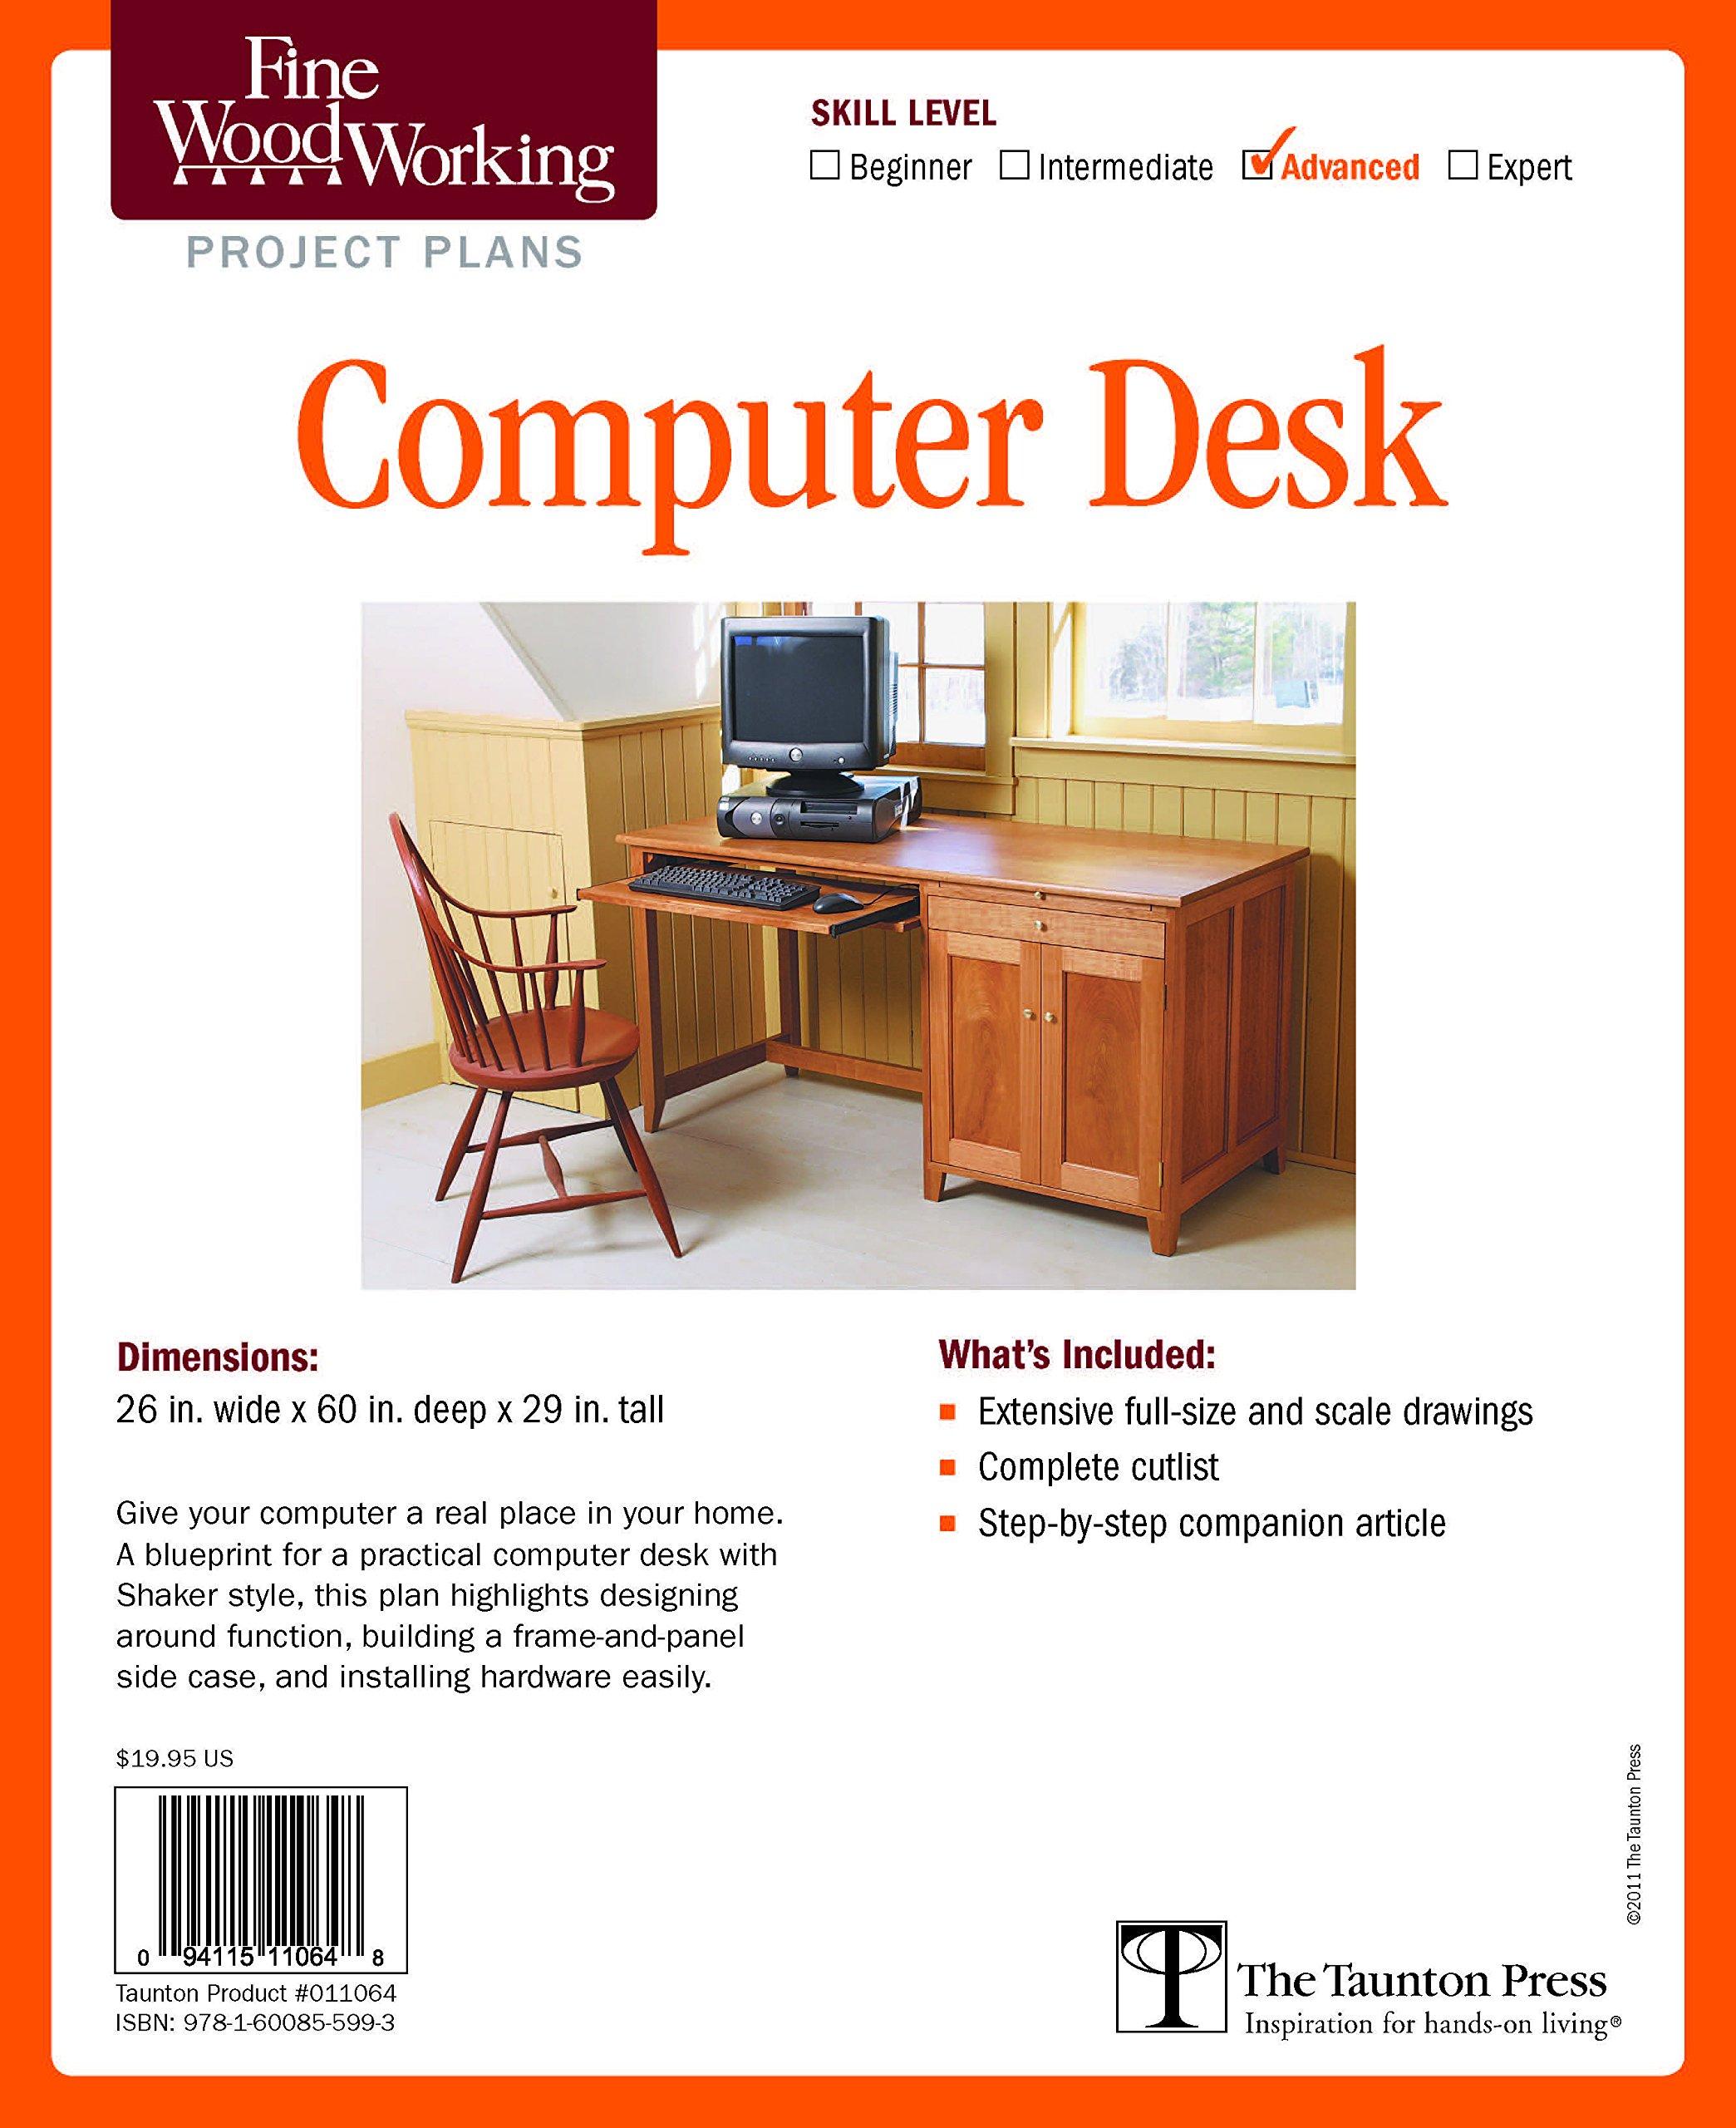 Fine Woodworking S Computer Desk Plan Editors Of Fine Woodworking